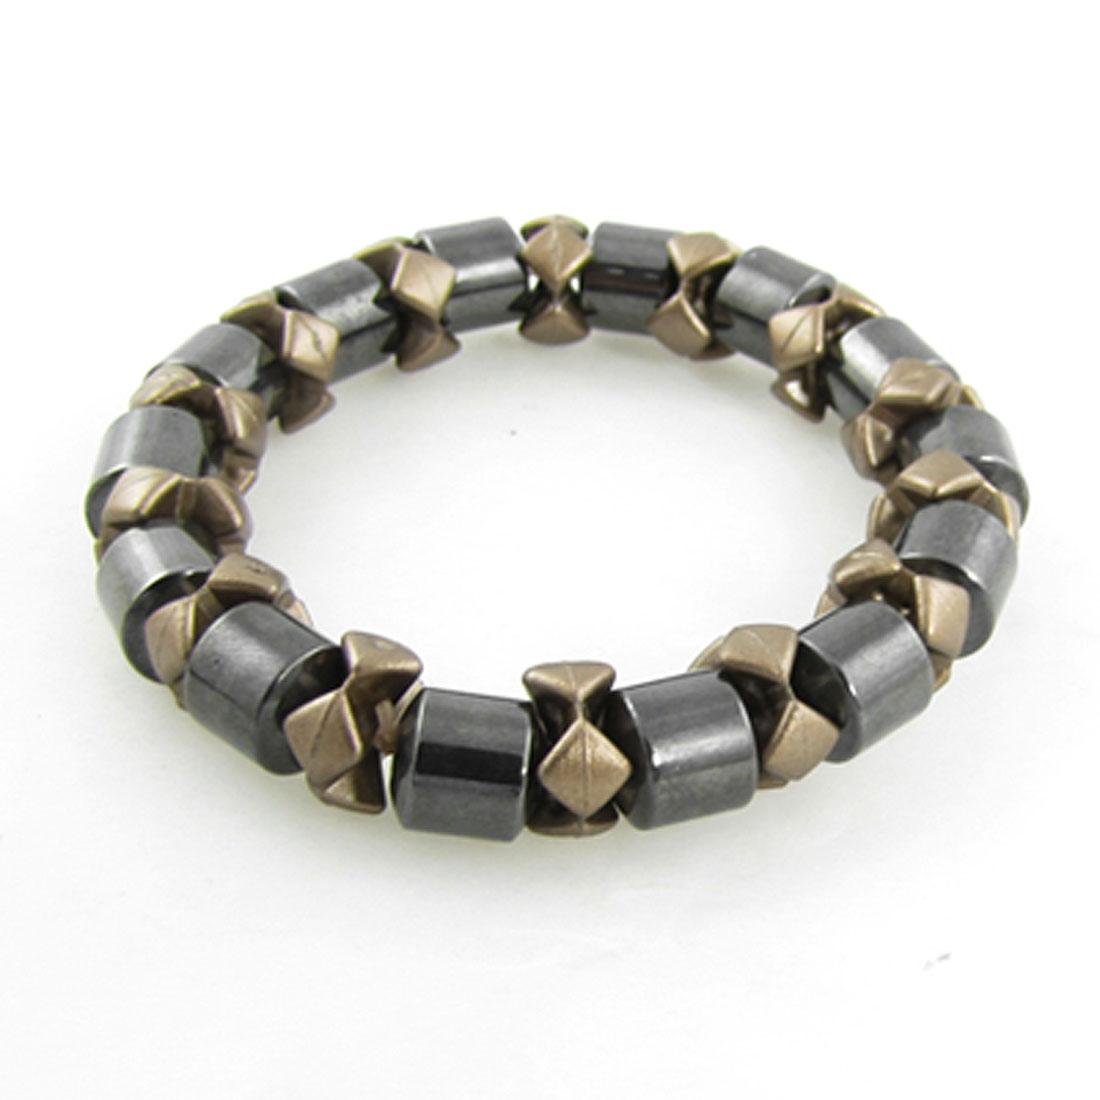 Elastic Band Linked Brown Dark Grey Magnetic Bracelet for Lady